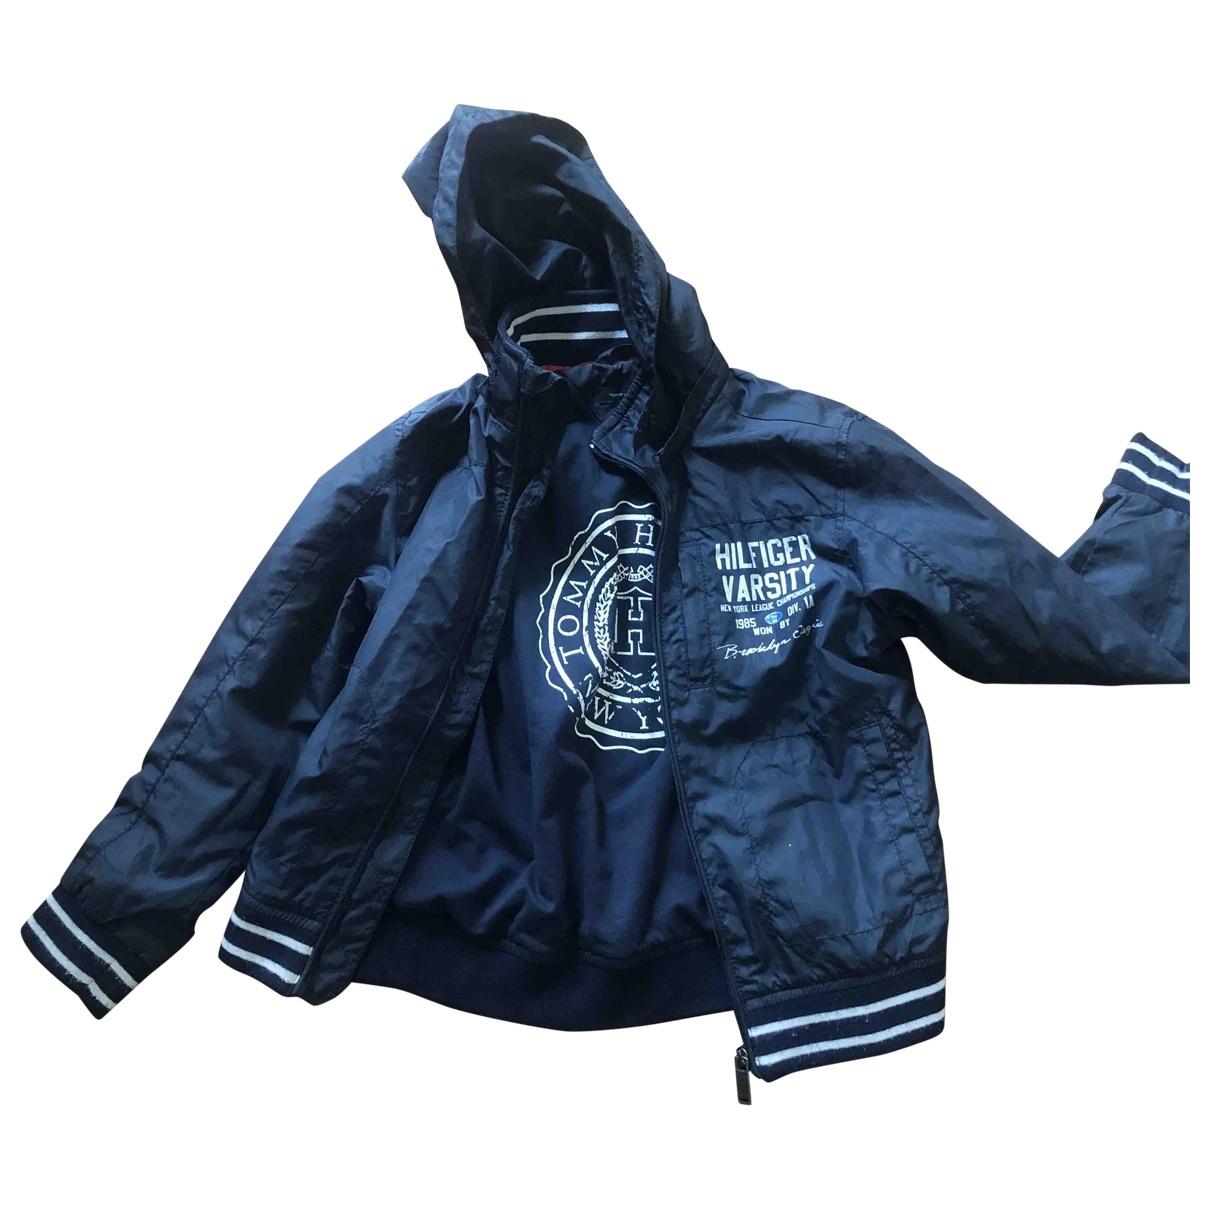 Tommy Hilfiger \N Blue jacket & coat for Kids 6 years - up to 114cm FR